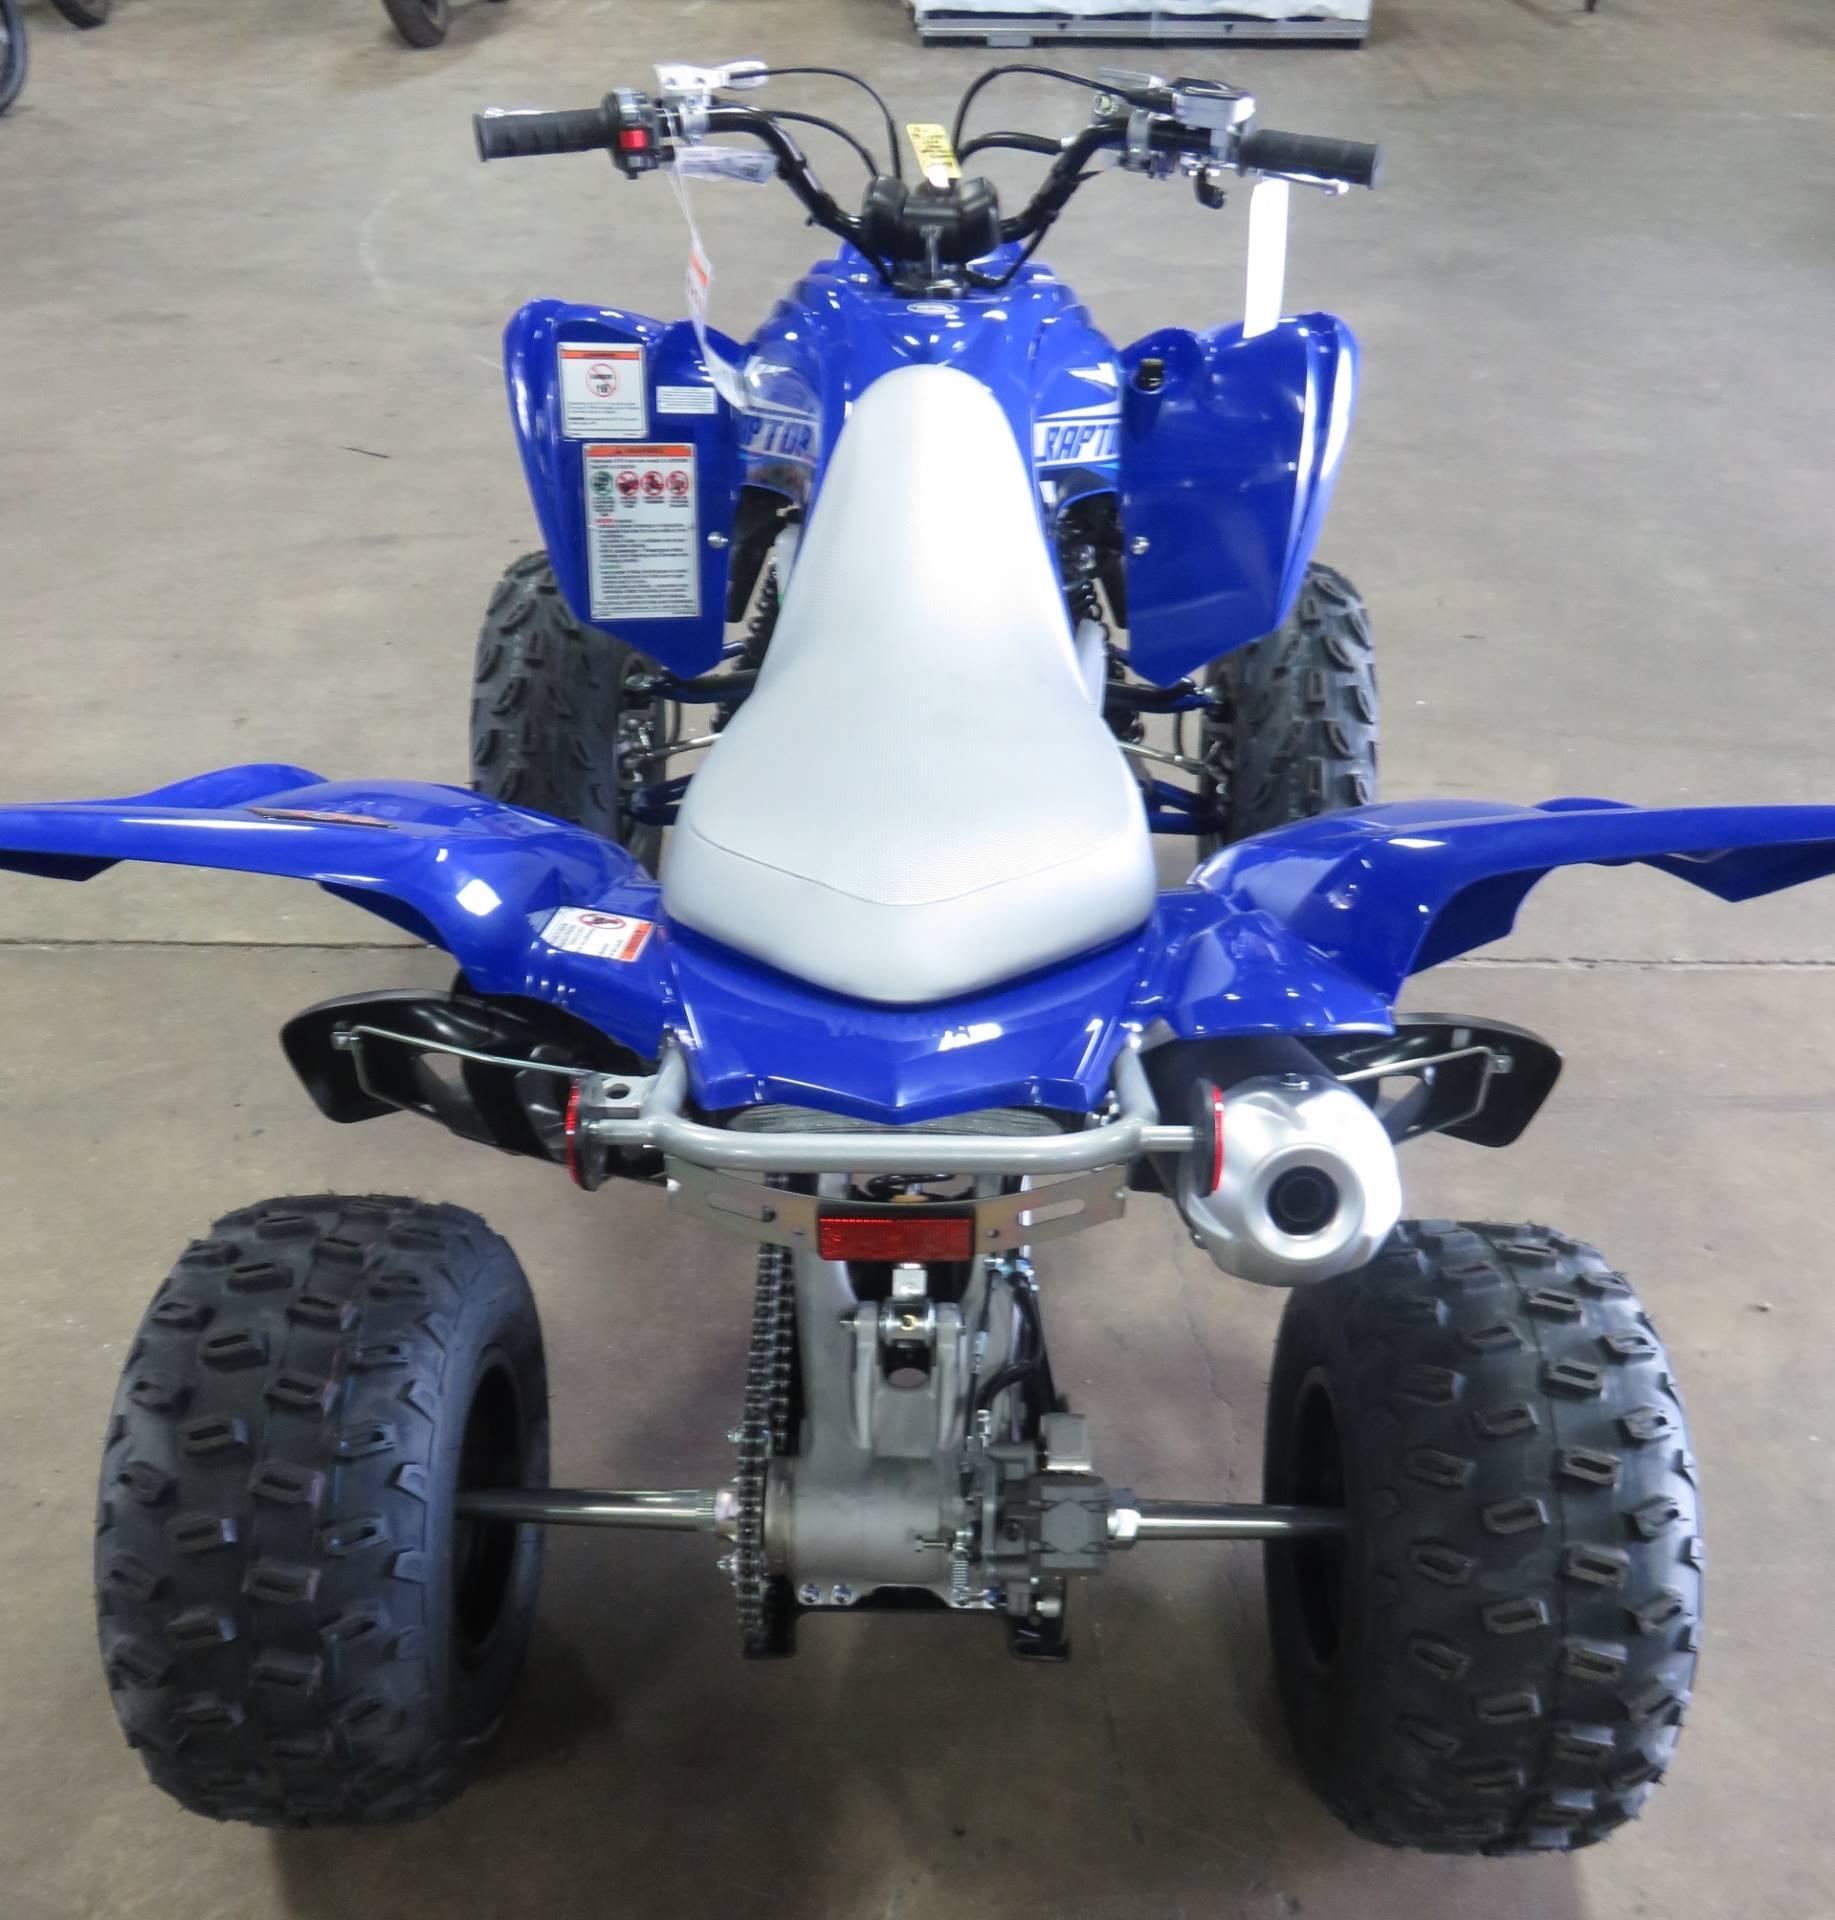 2020 Yamaha Raptor 700R 3